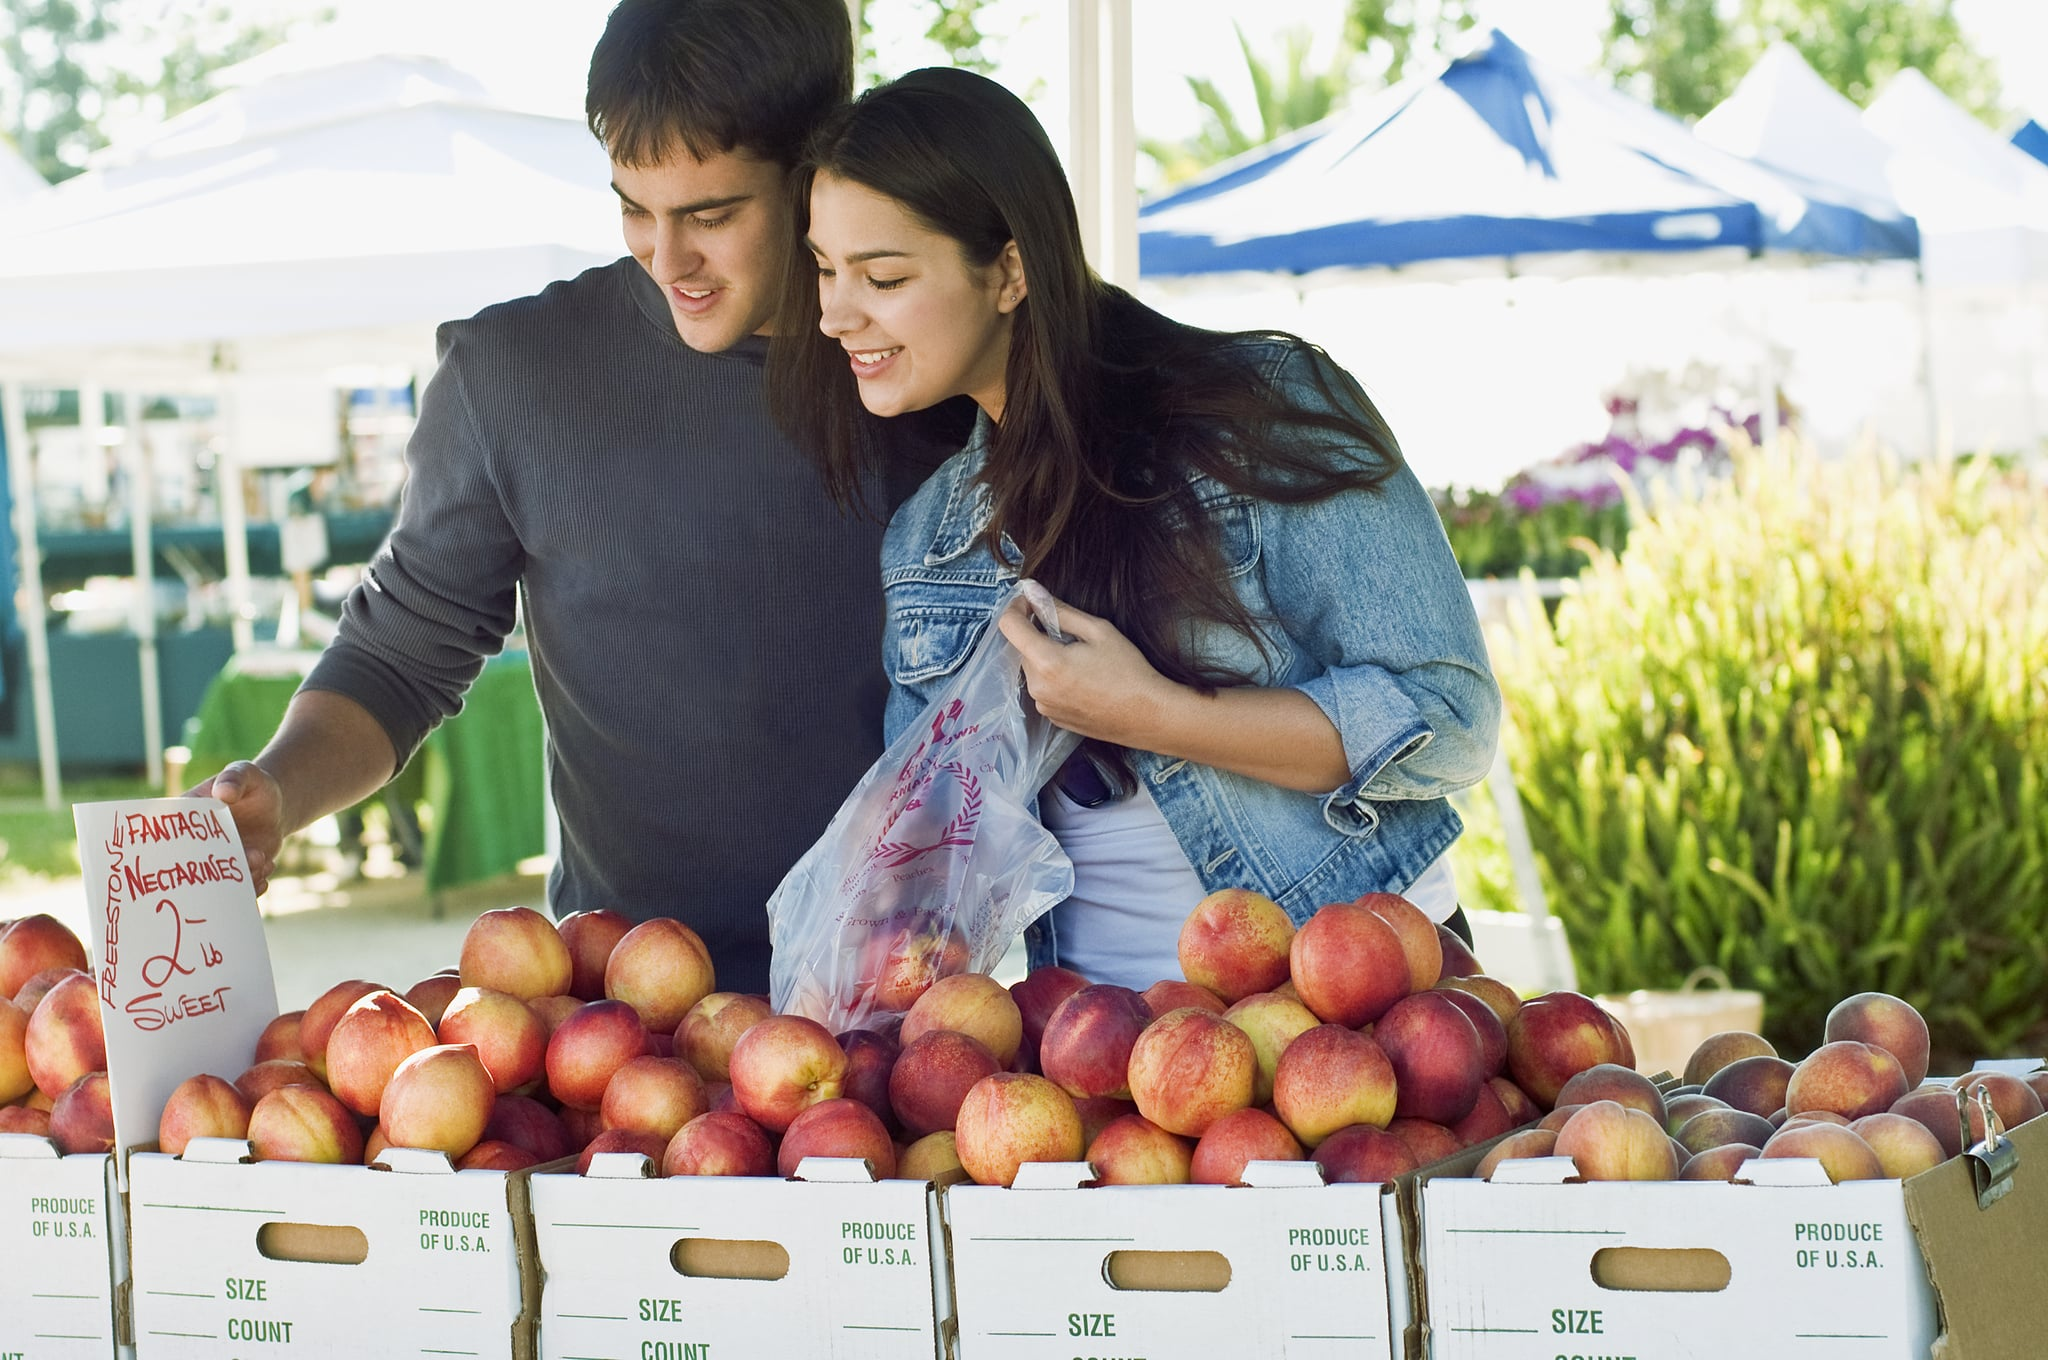 Turn fruit shopping into social hour.